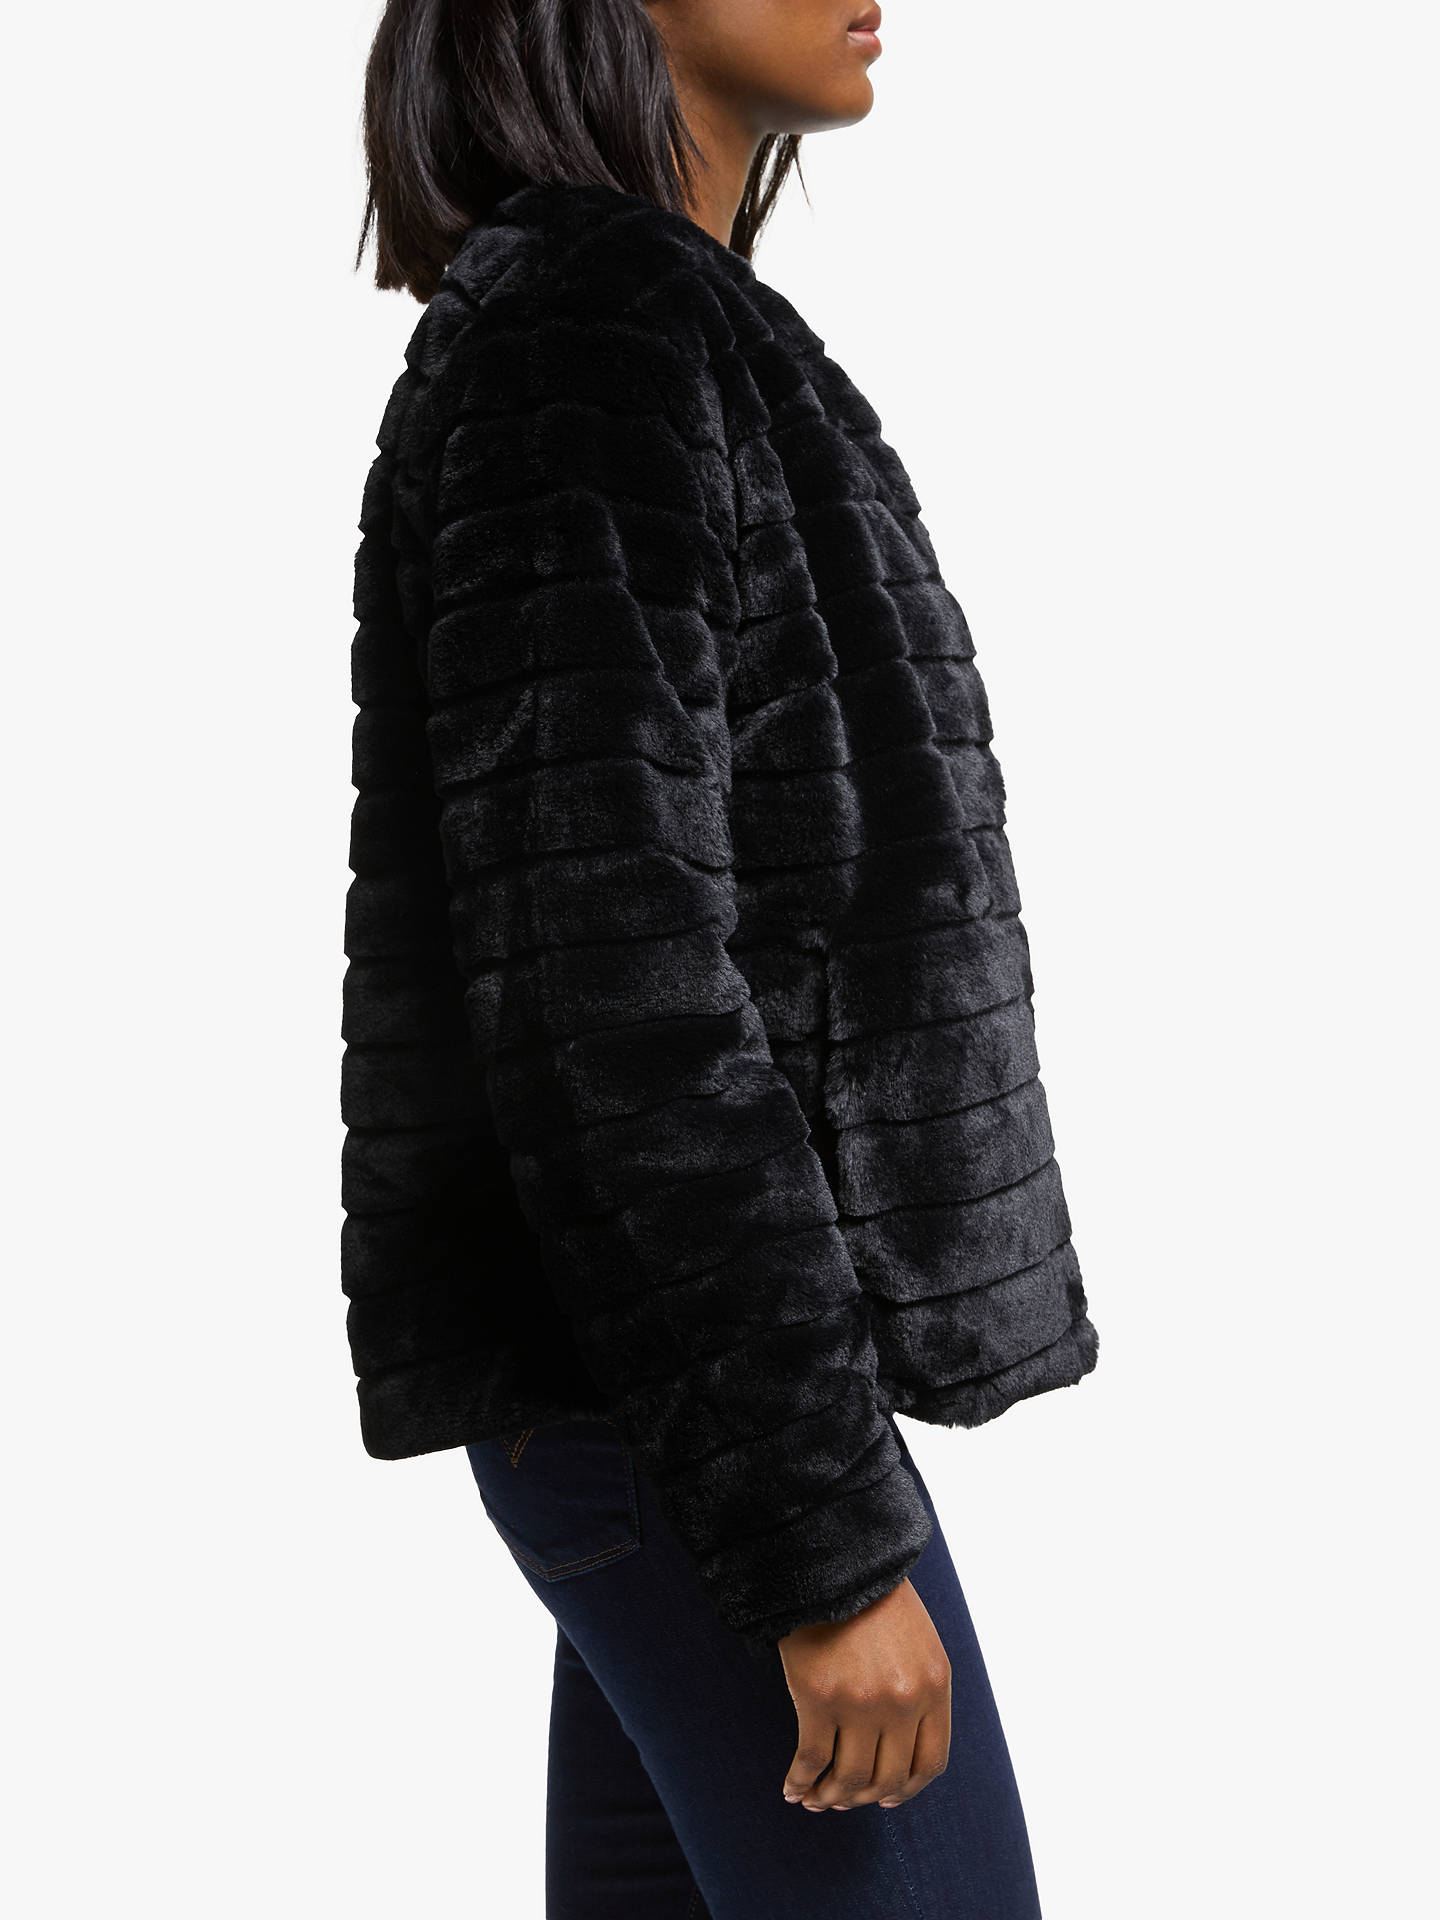 Lauren Ralph Lauren Faux Fur Coat, Black at John Lewis ...